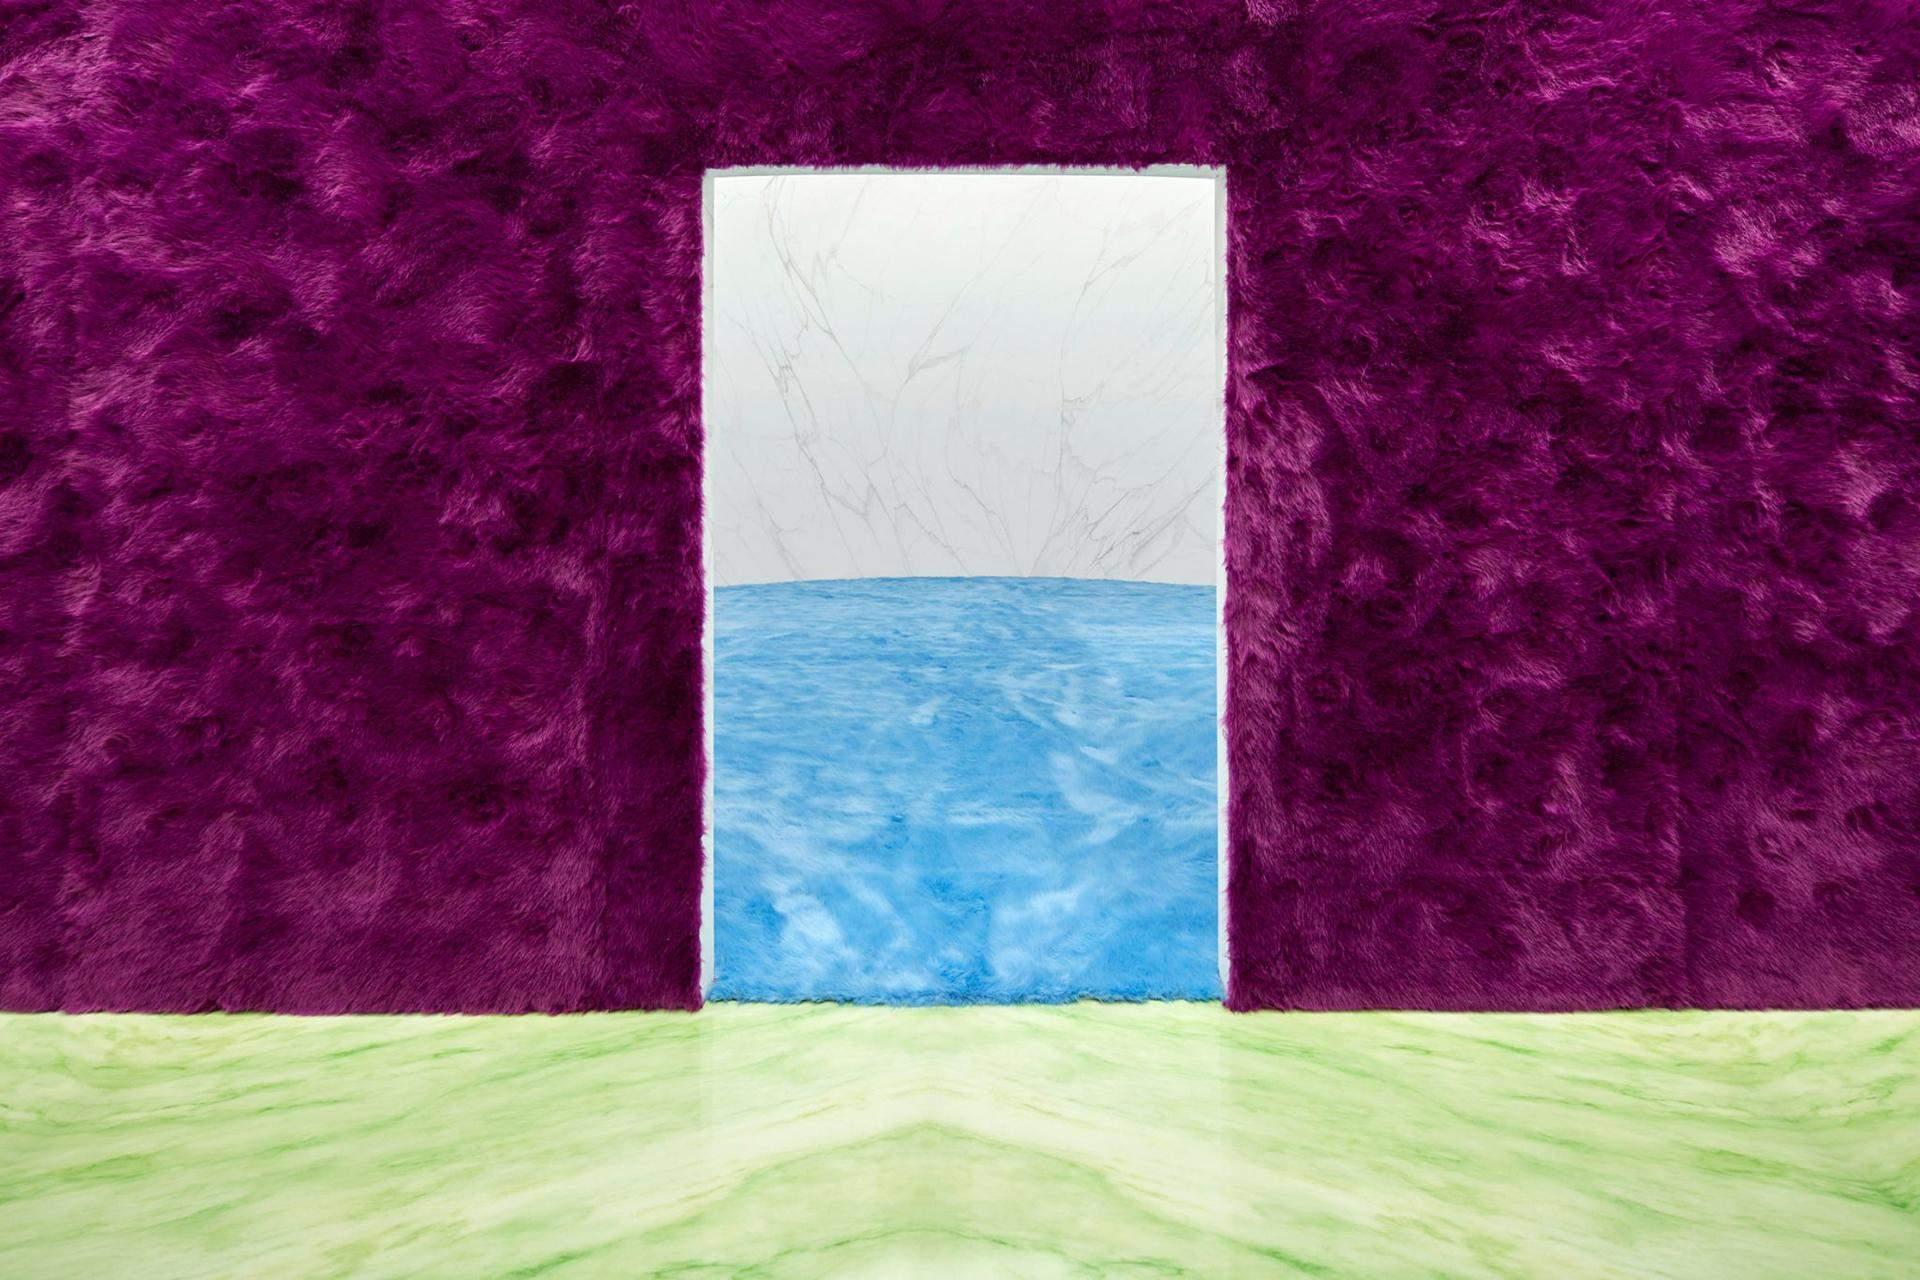 Синее мех на полу напоминает море